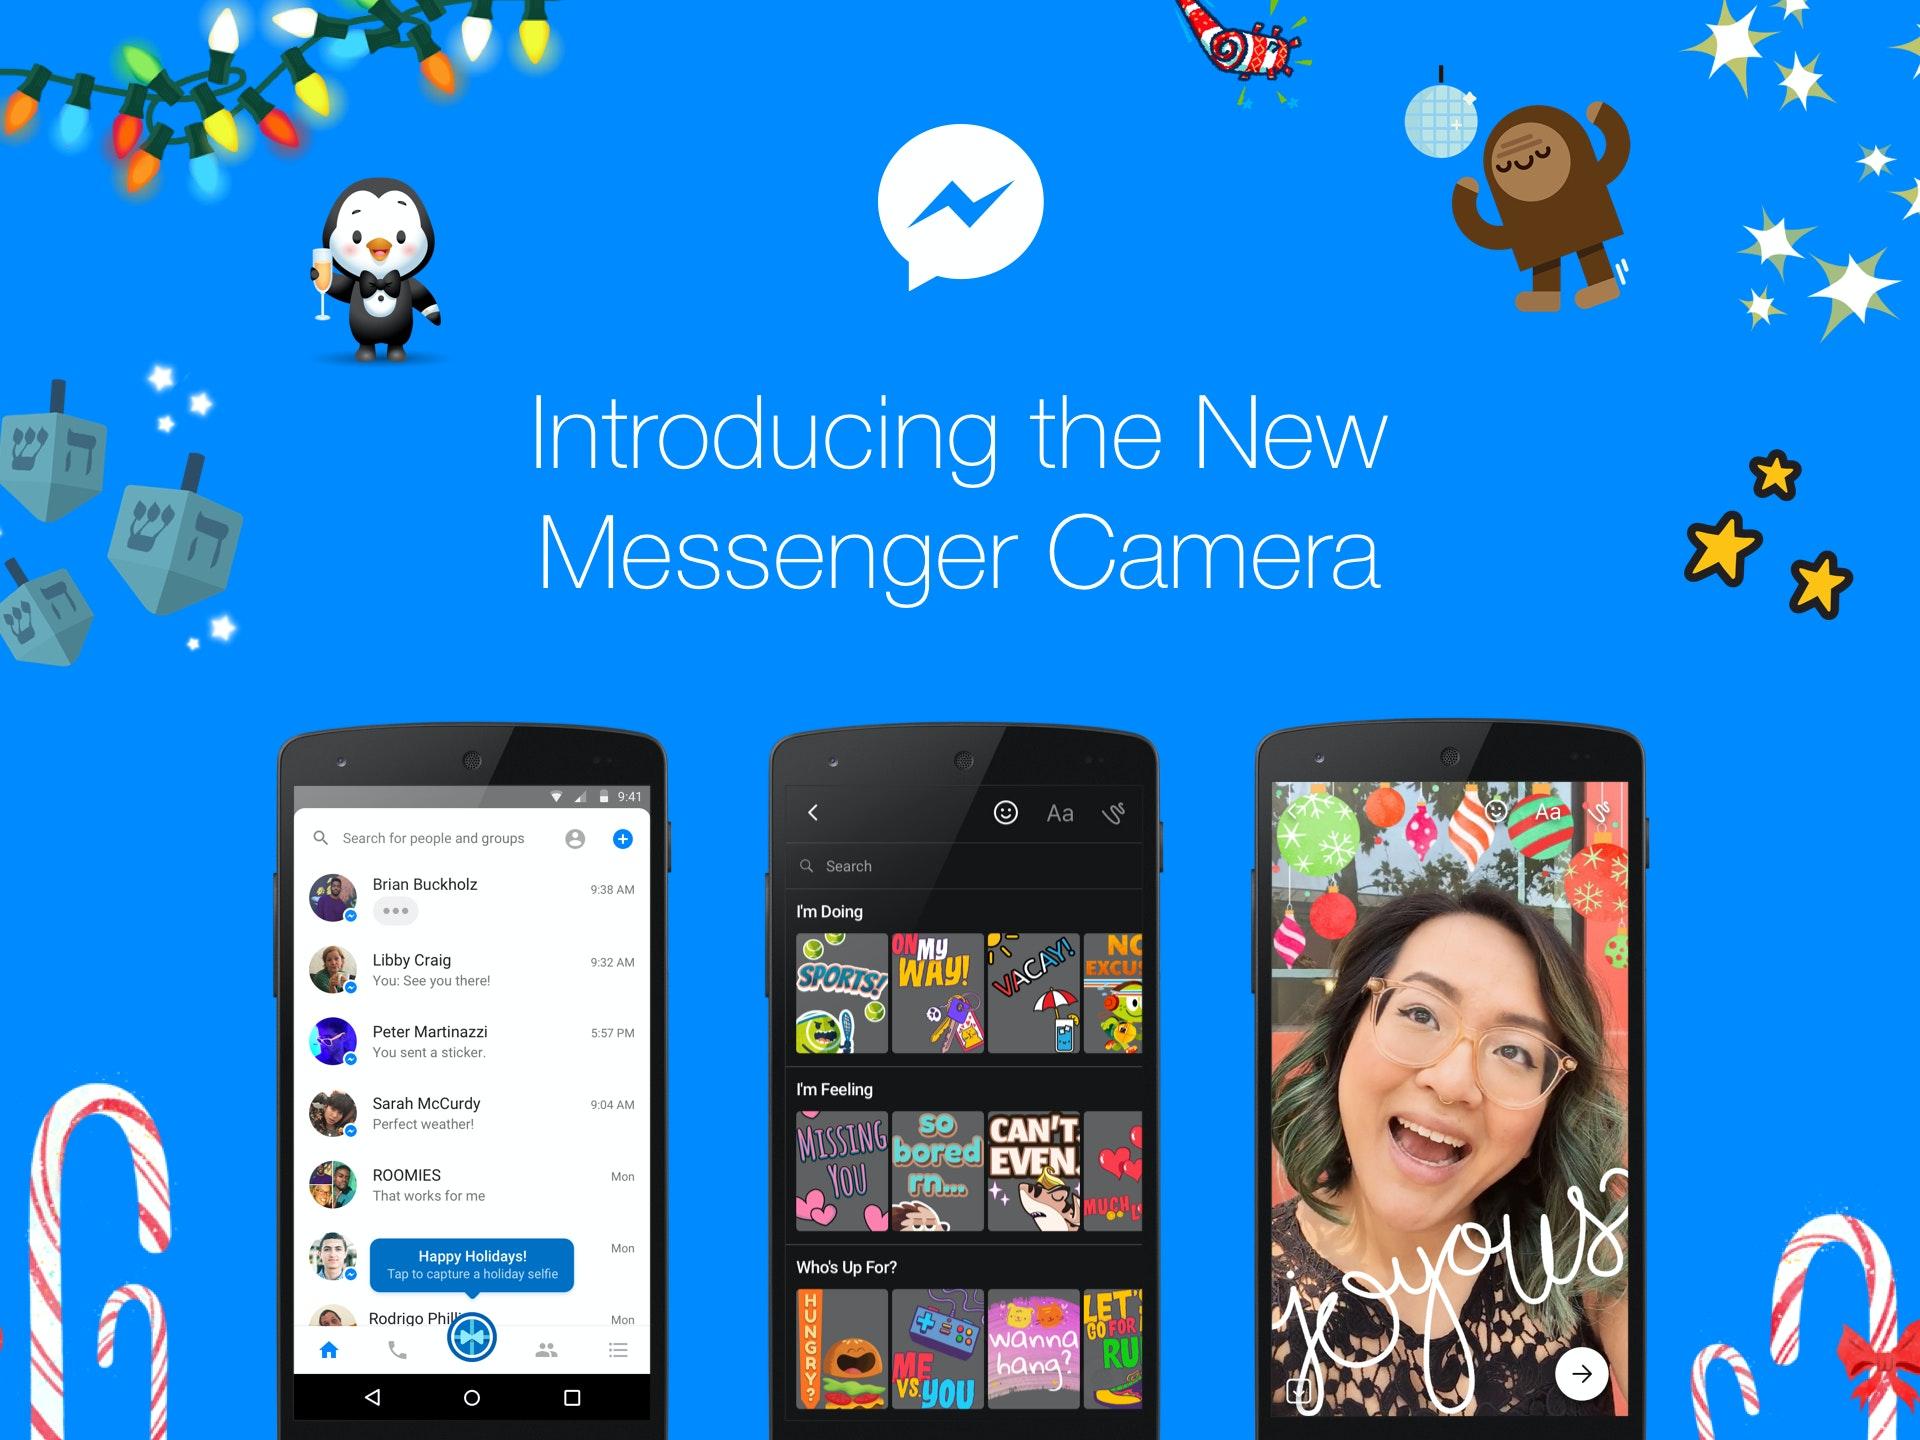 New Messenger Camera